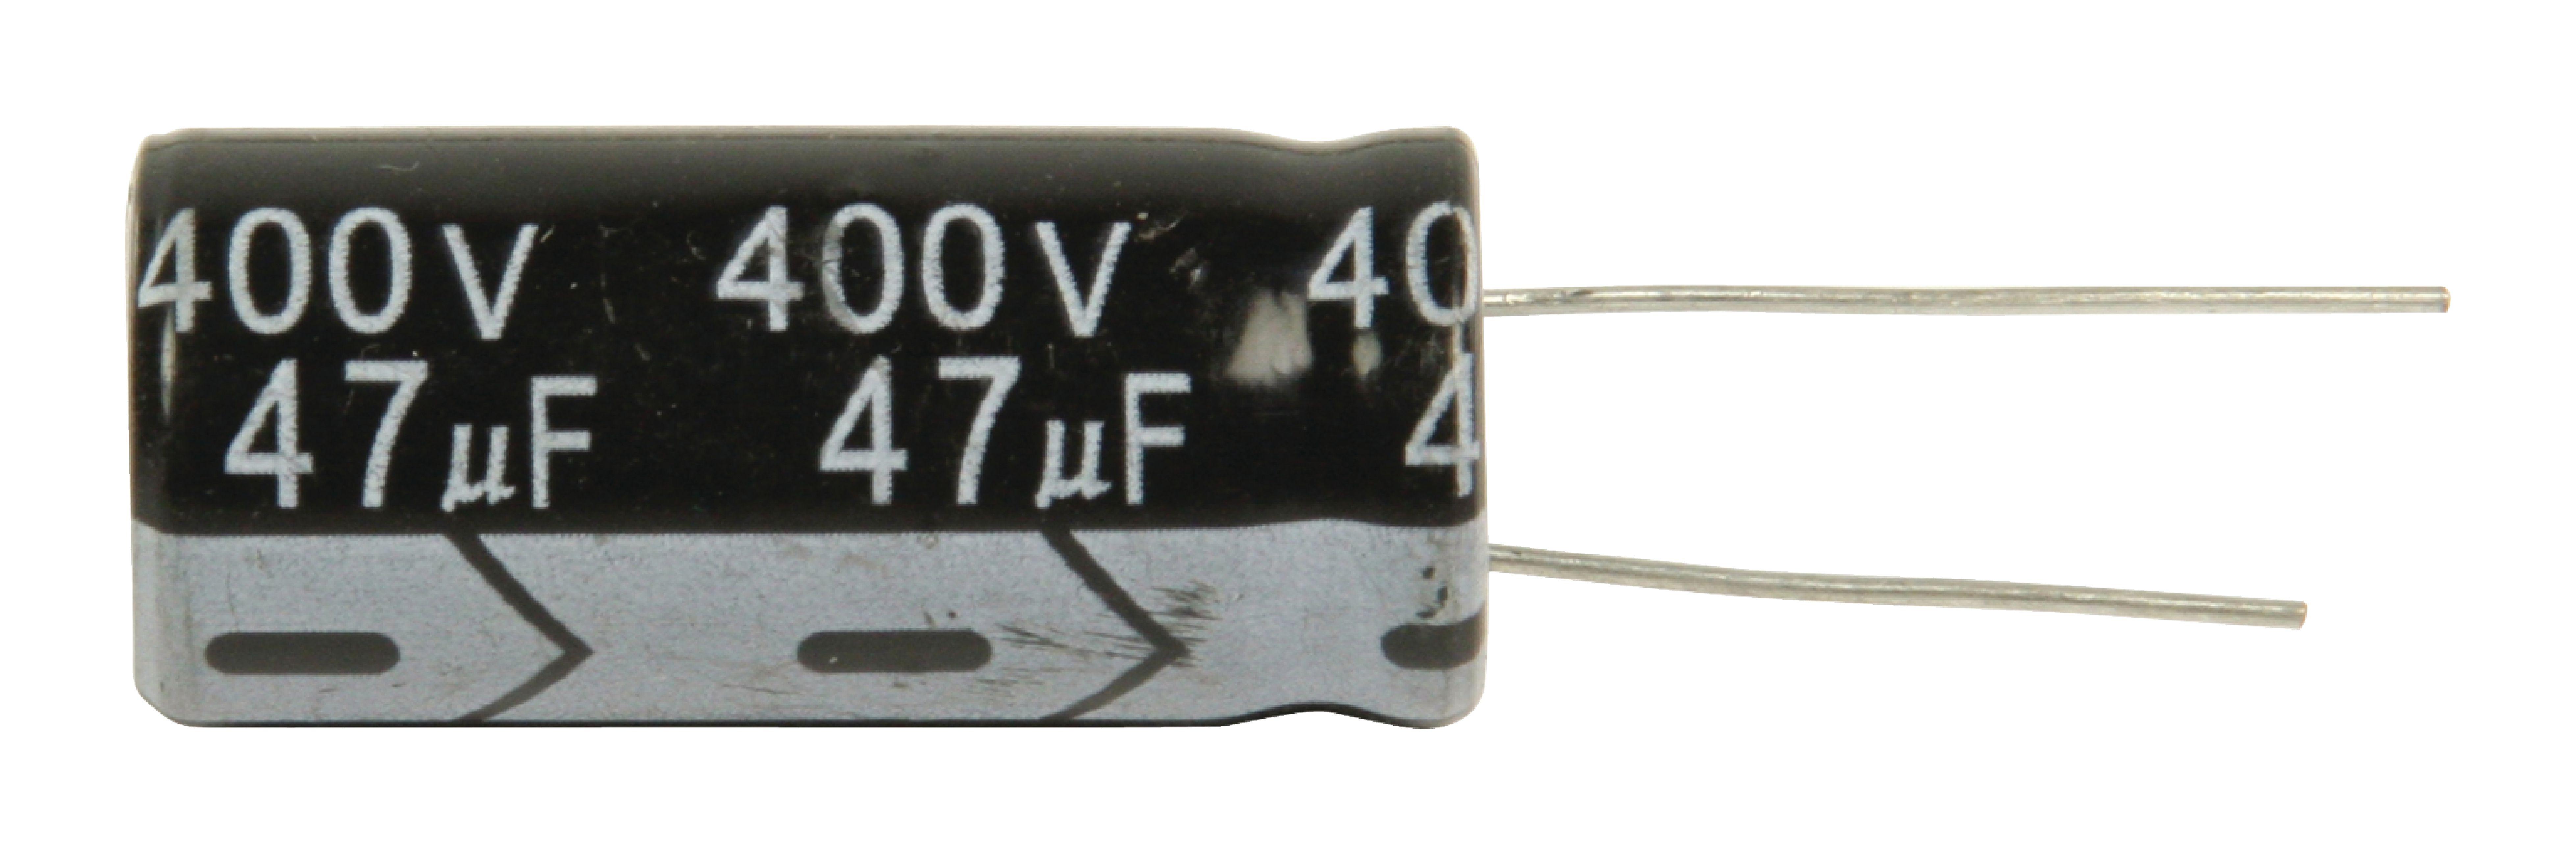 47 400pht Fixapart Electrolytic Capacitor 47 Uf 400